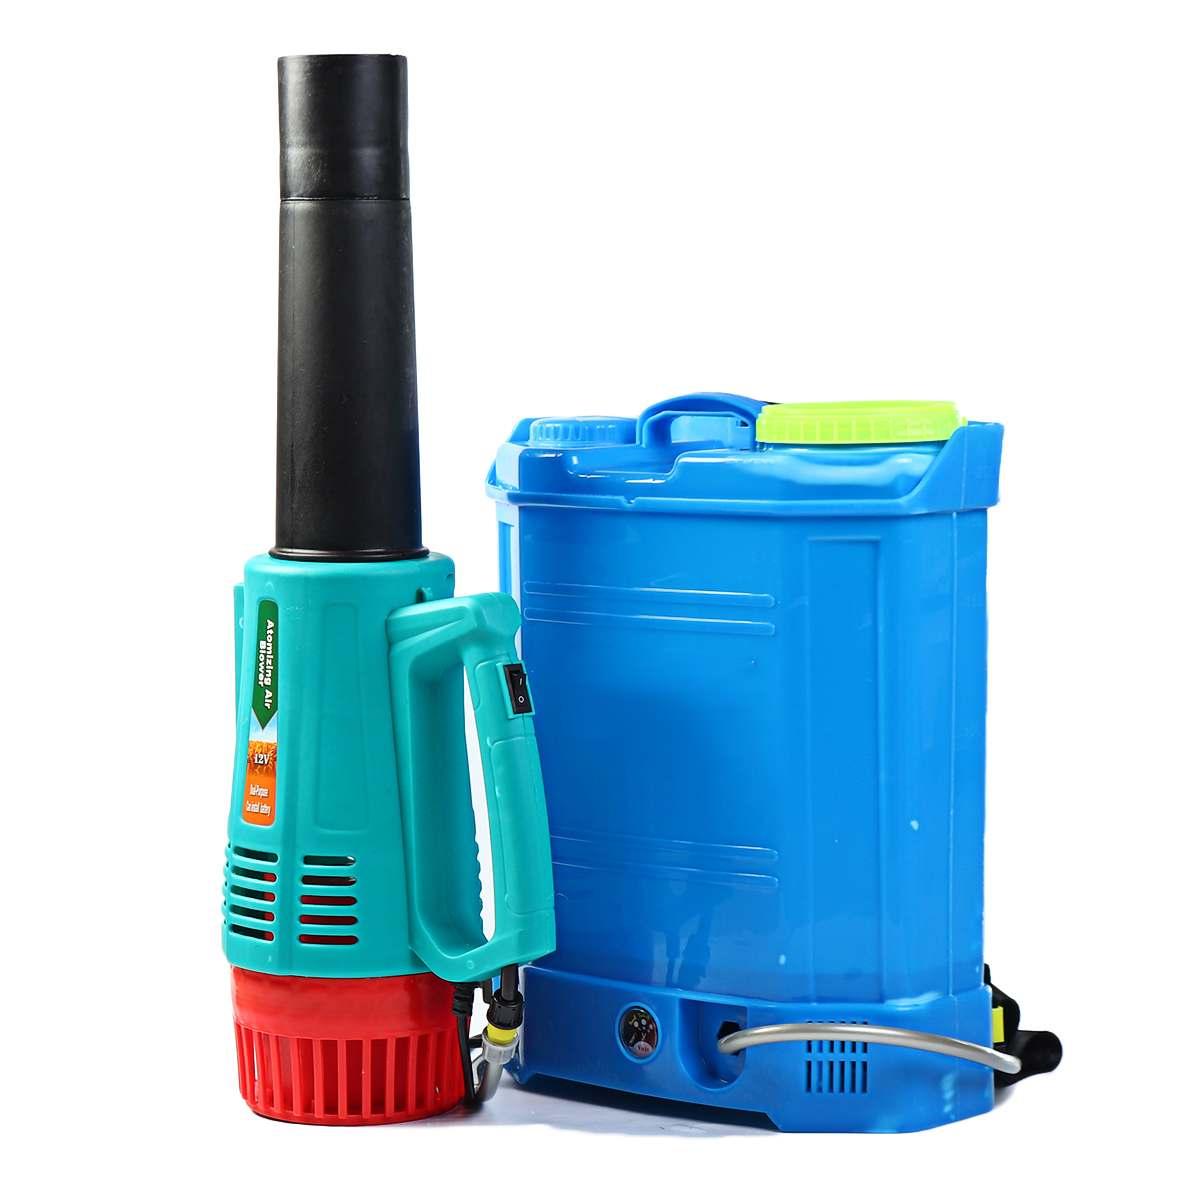 20L Electric Sprayer Intelligent Agricultural Pesticide dispenser Garden equipment 220V Rechargeable Lead acid battery-1